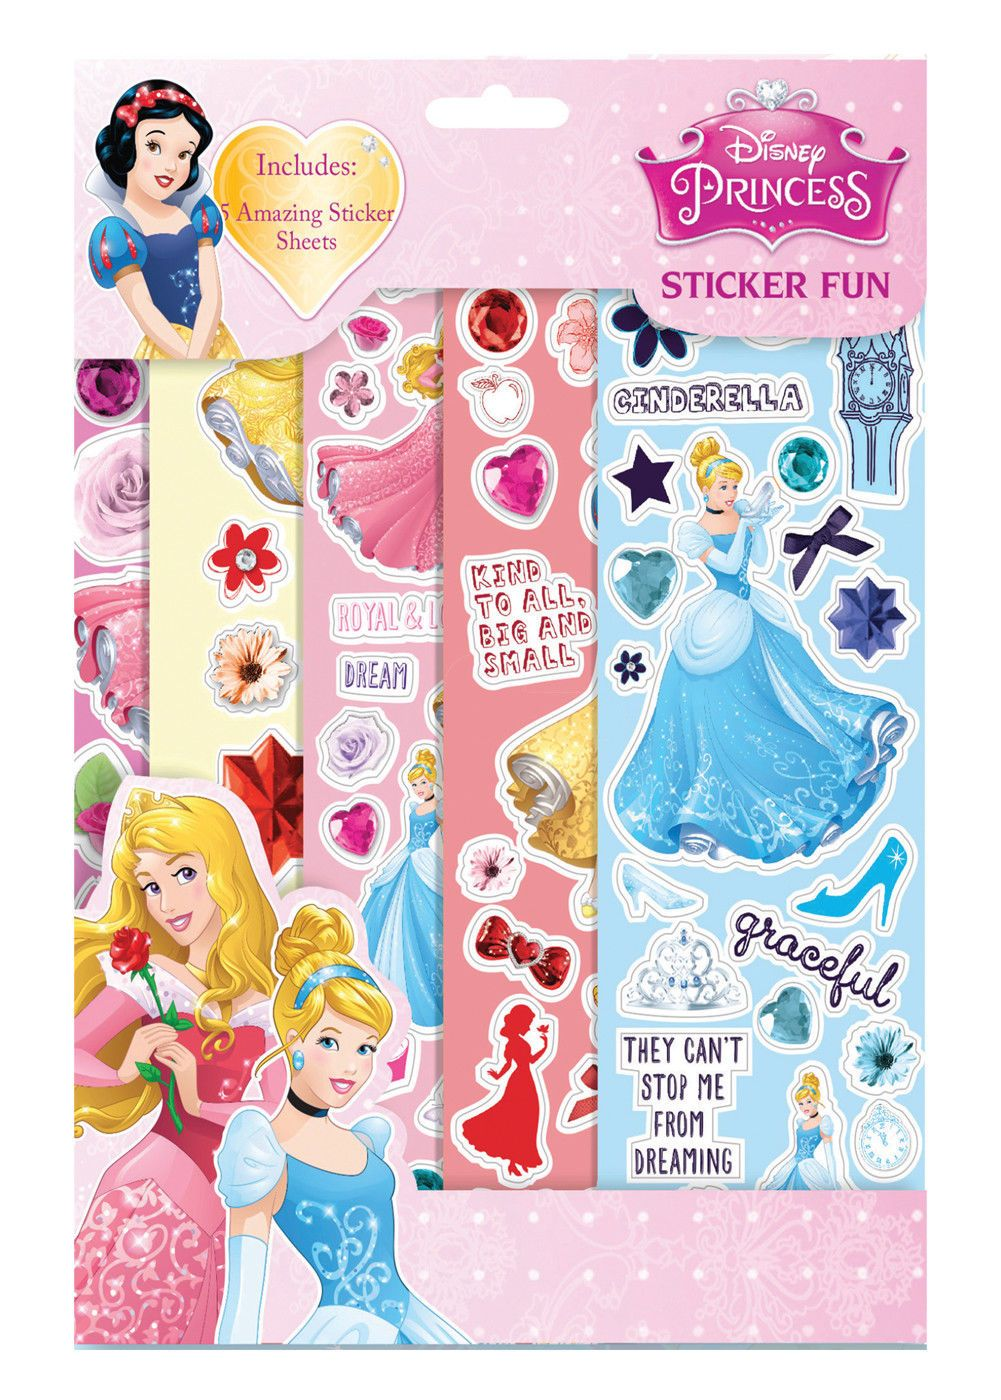 Disney Princess Pack of 5 Sheets Loot Bag Reusable Sticker Fun Kids Party